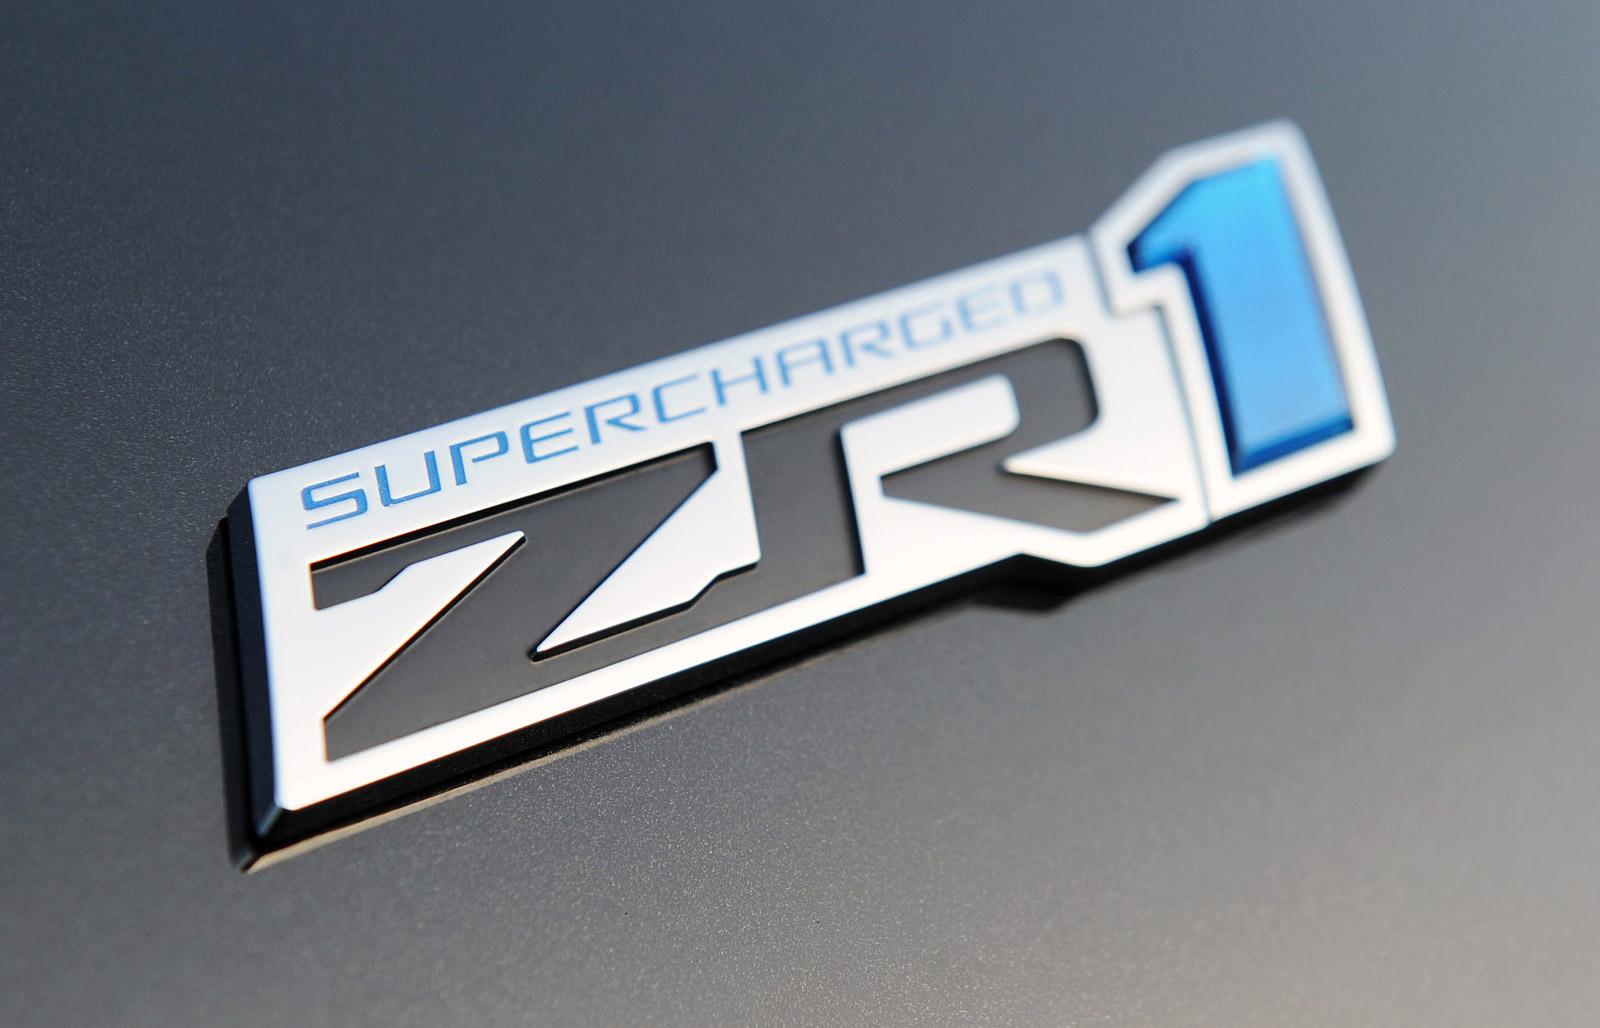 2017 corvette zora zr1 specs price autos concept - 2017 Corvette Zora Zr1 Specs Price Autos Concept 38